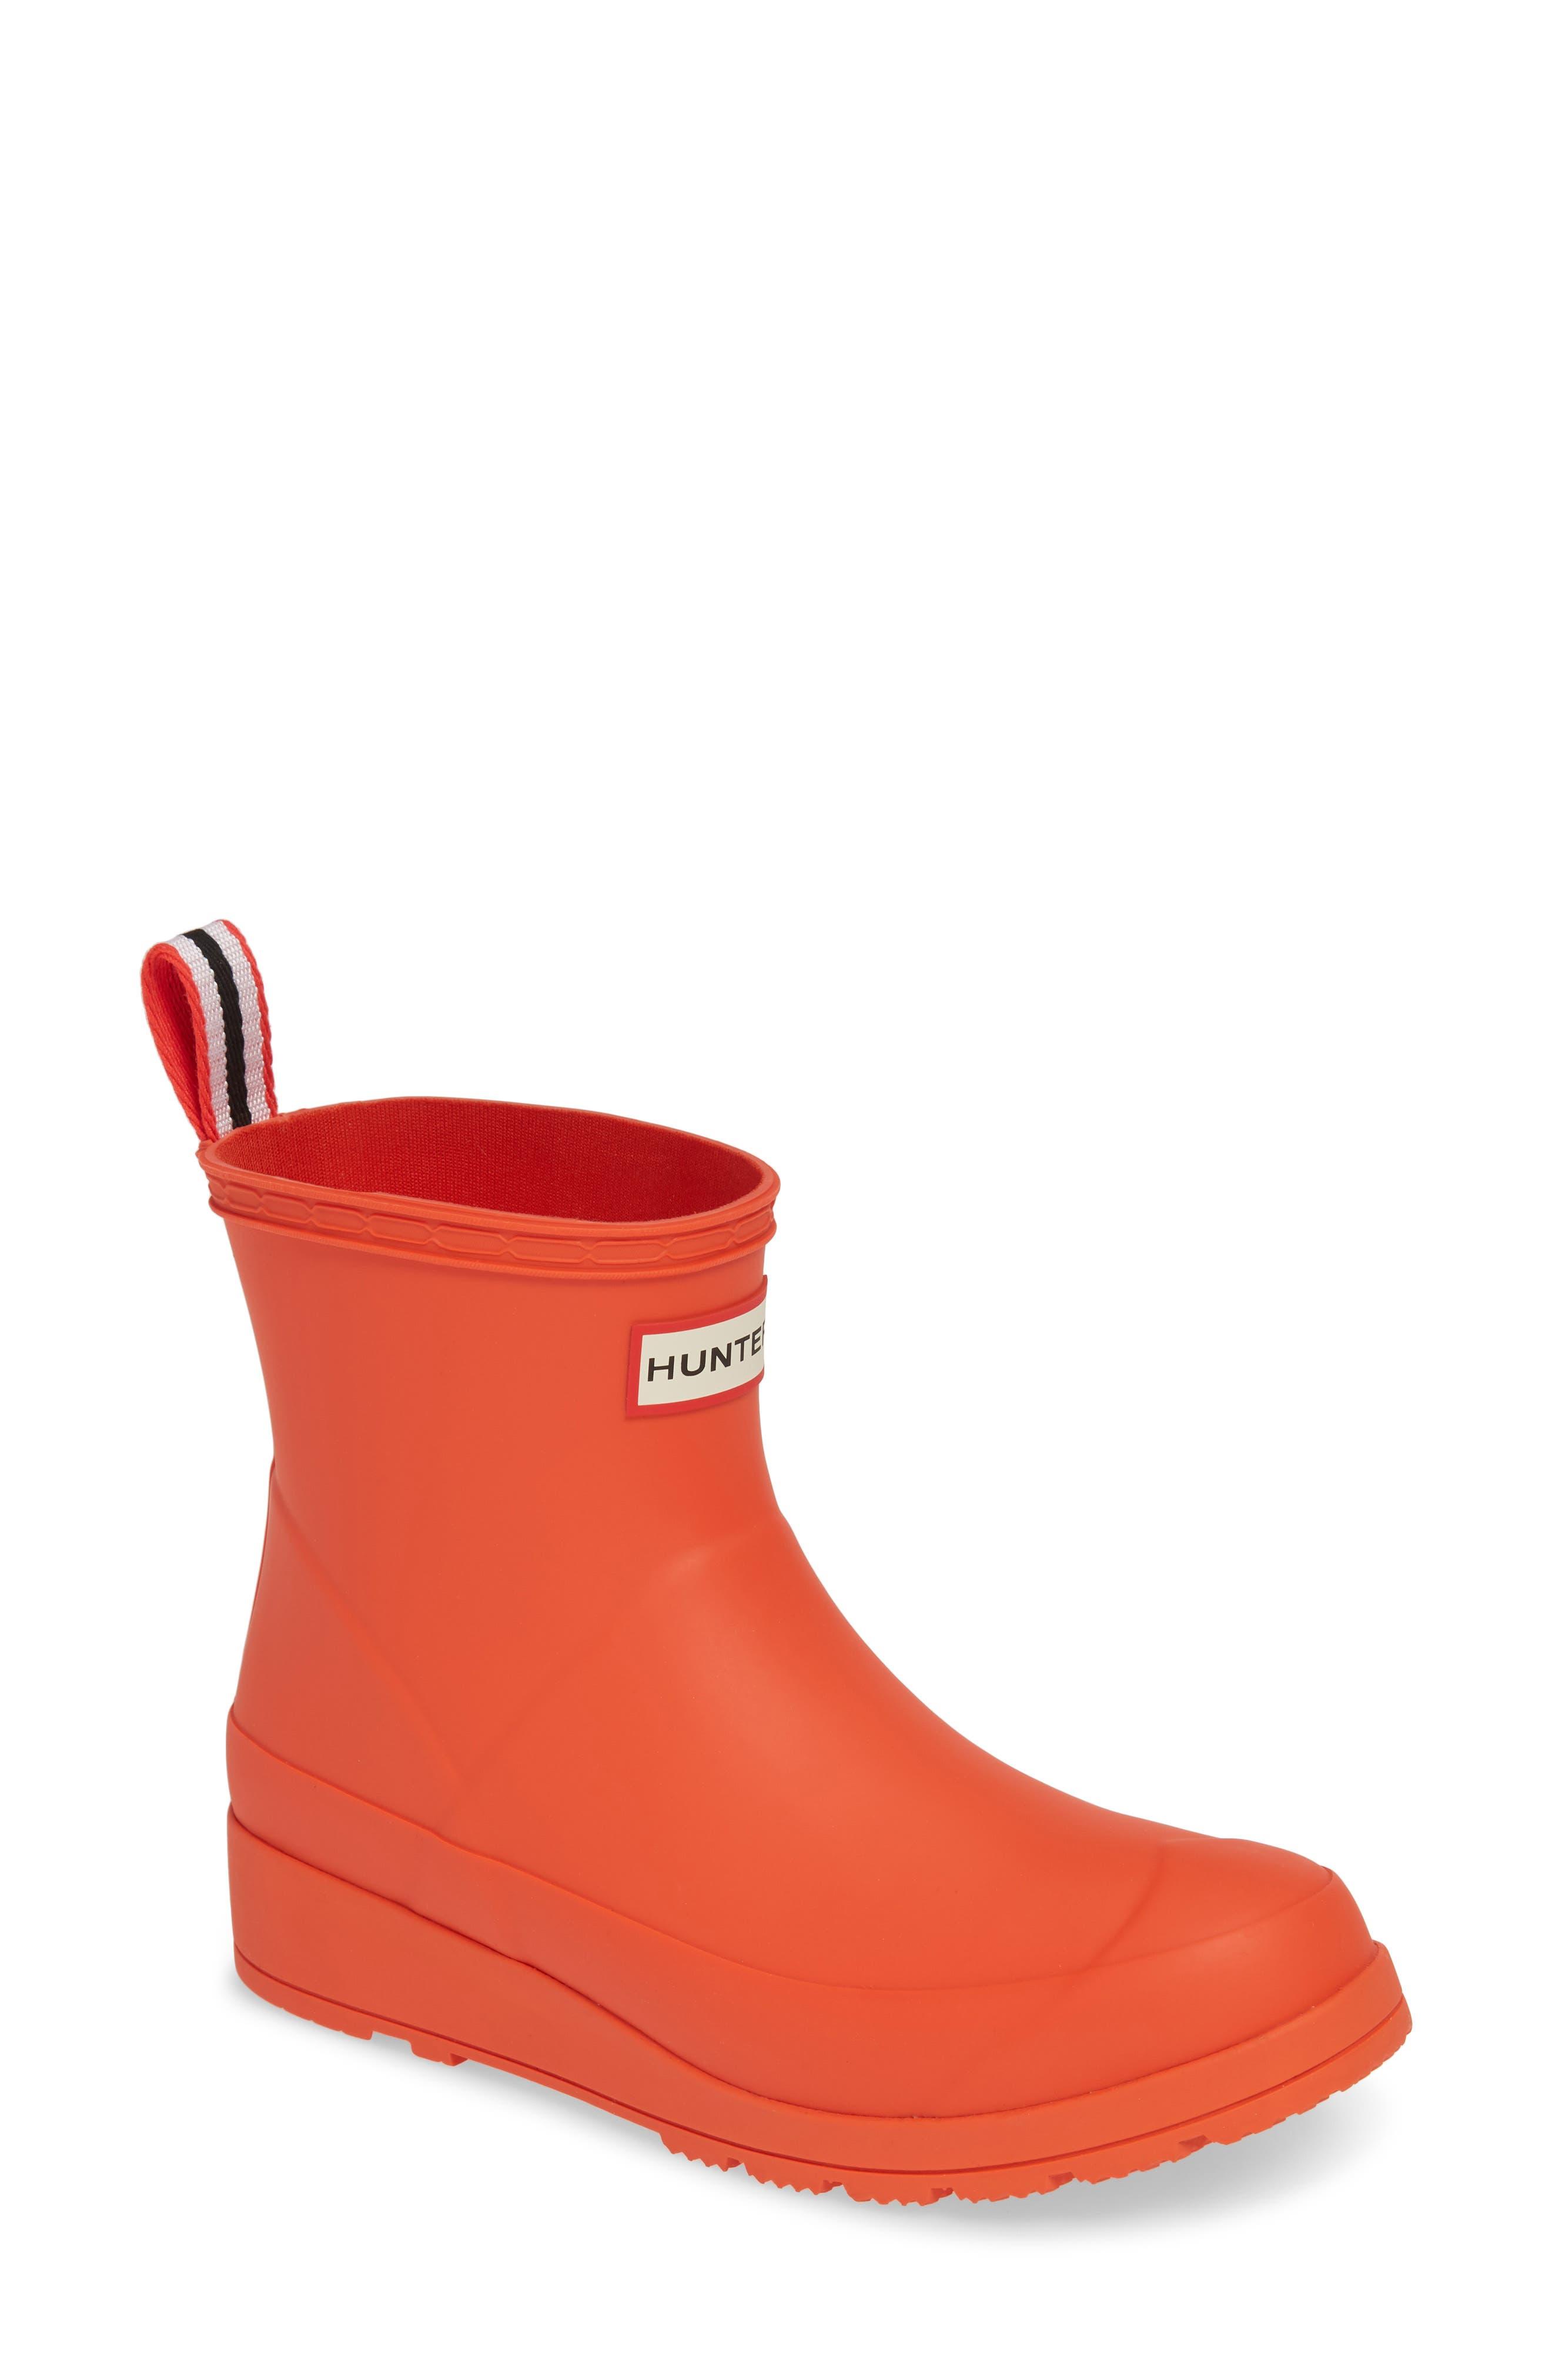 HUNTER Original Play Waterproof Rain Bootie, Main, color, LIGHTHOUSE